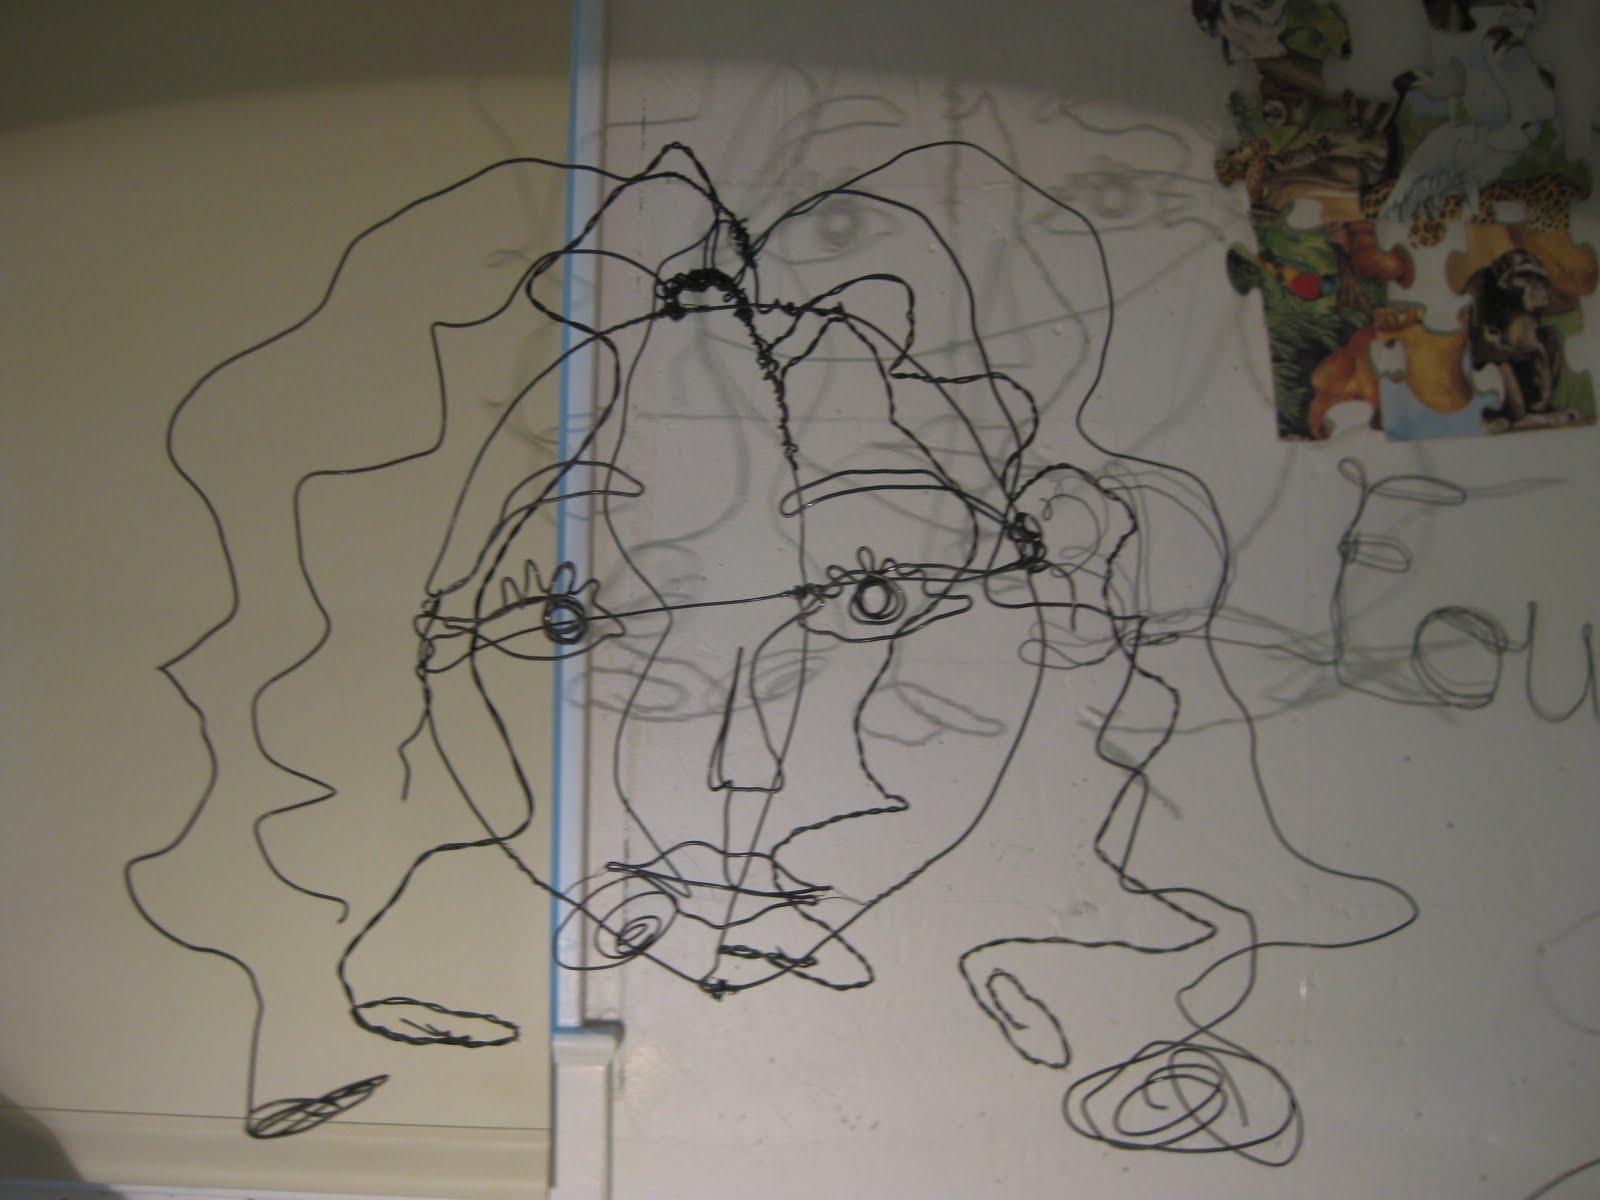 3d Wire Sculpture Self Portrait Center Water H2o Atomic Diagram Royalty Free Stock Photo Image 11549985 La Creative Design Recent Work Foundations Rh Lacreativedesign Blogspot Com Art Abstract